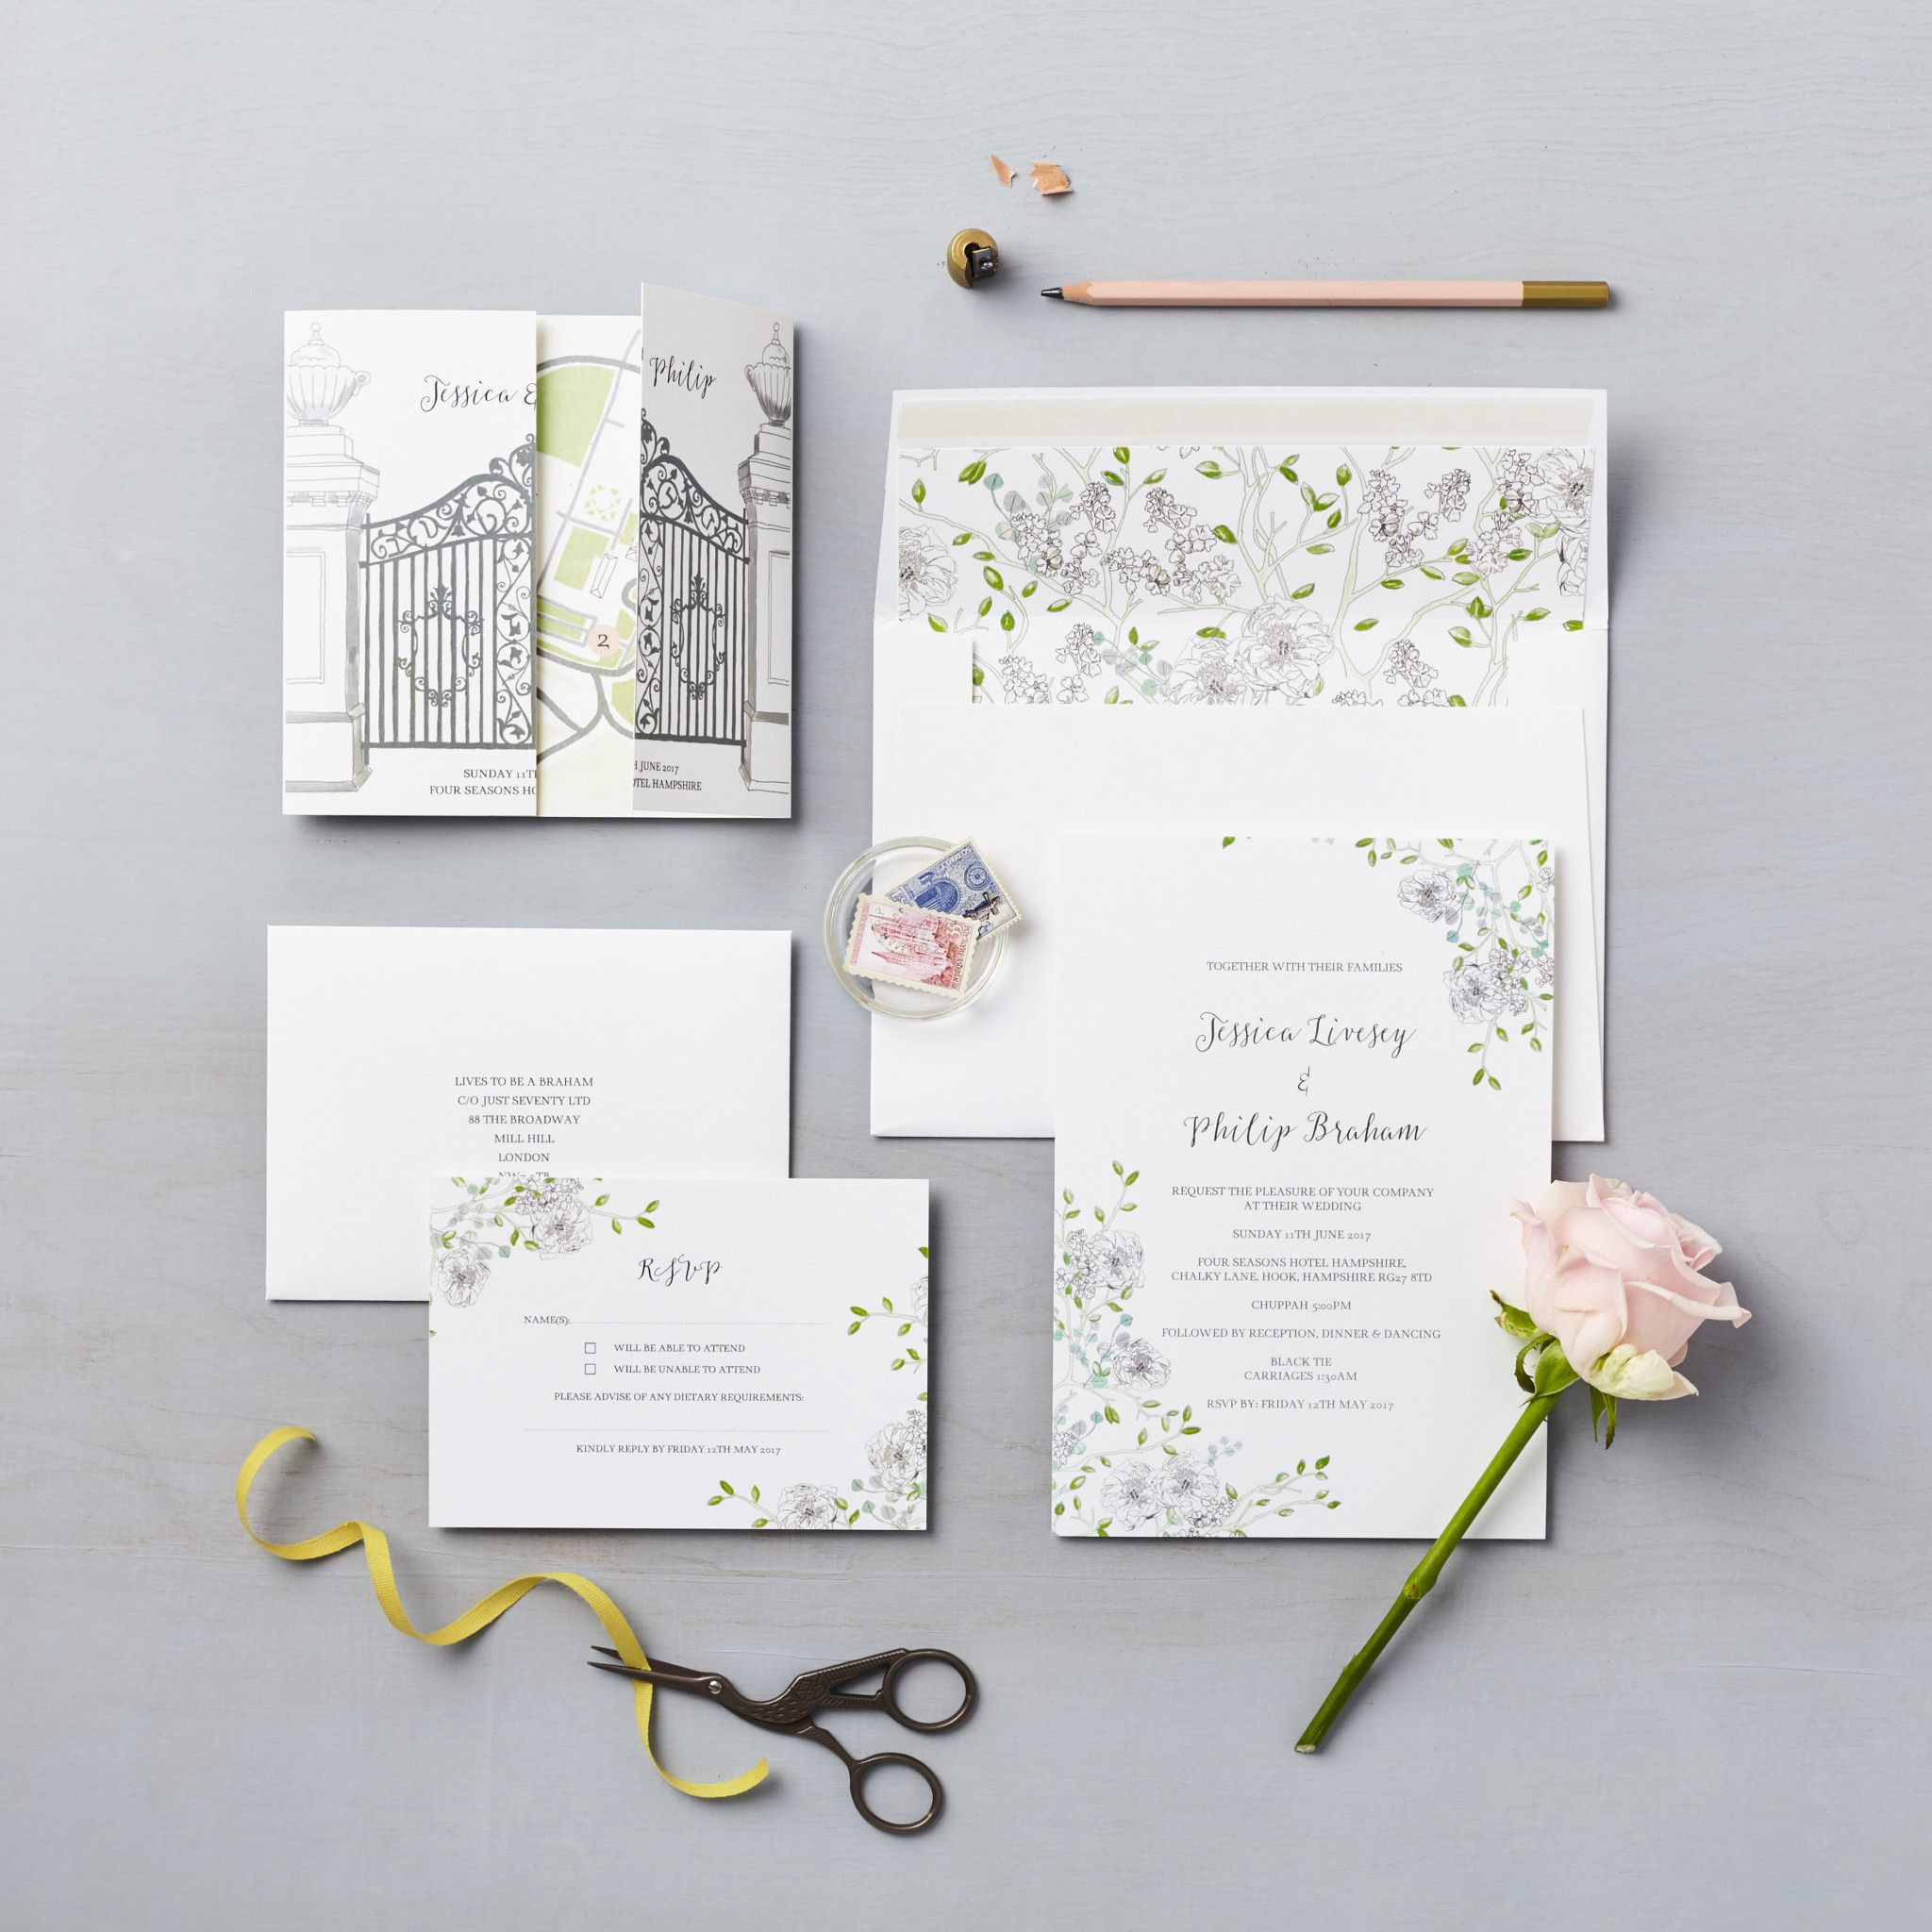 Hampshire wedding Four Seasons Bespoke floral wedding invitation ...